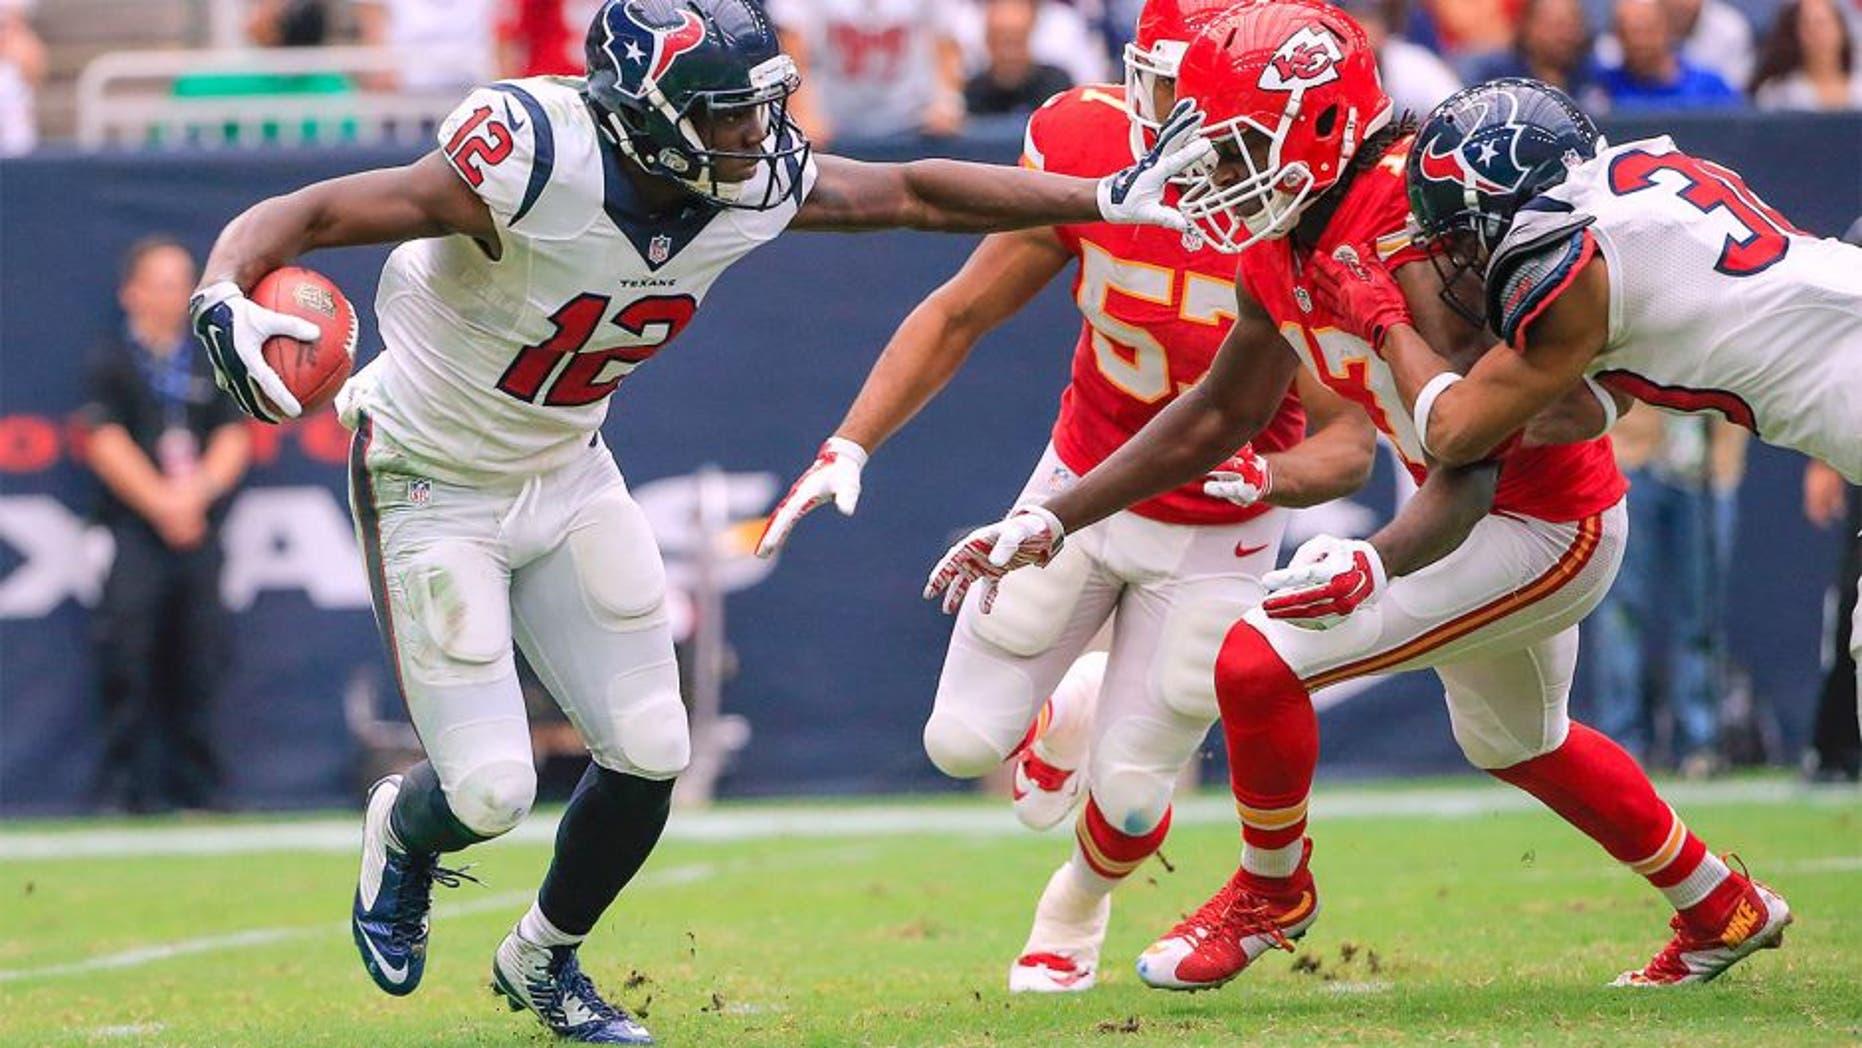 Sep 13, 2015; Houston, TX, USA; Houston Texans wide receiver Keith Mumphery (12) stiff arms Kansas City Chiefs wide receiver Chris Conley (17) during the game at NRG Stadium. Mandatory Credit: Kevin Jairaj-USA TODAY Sports